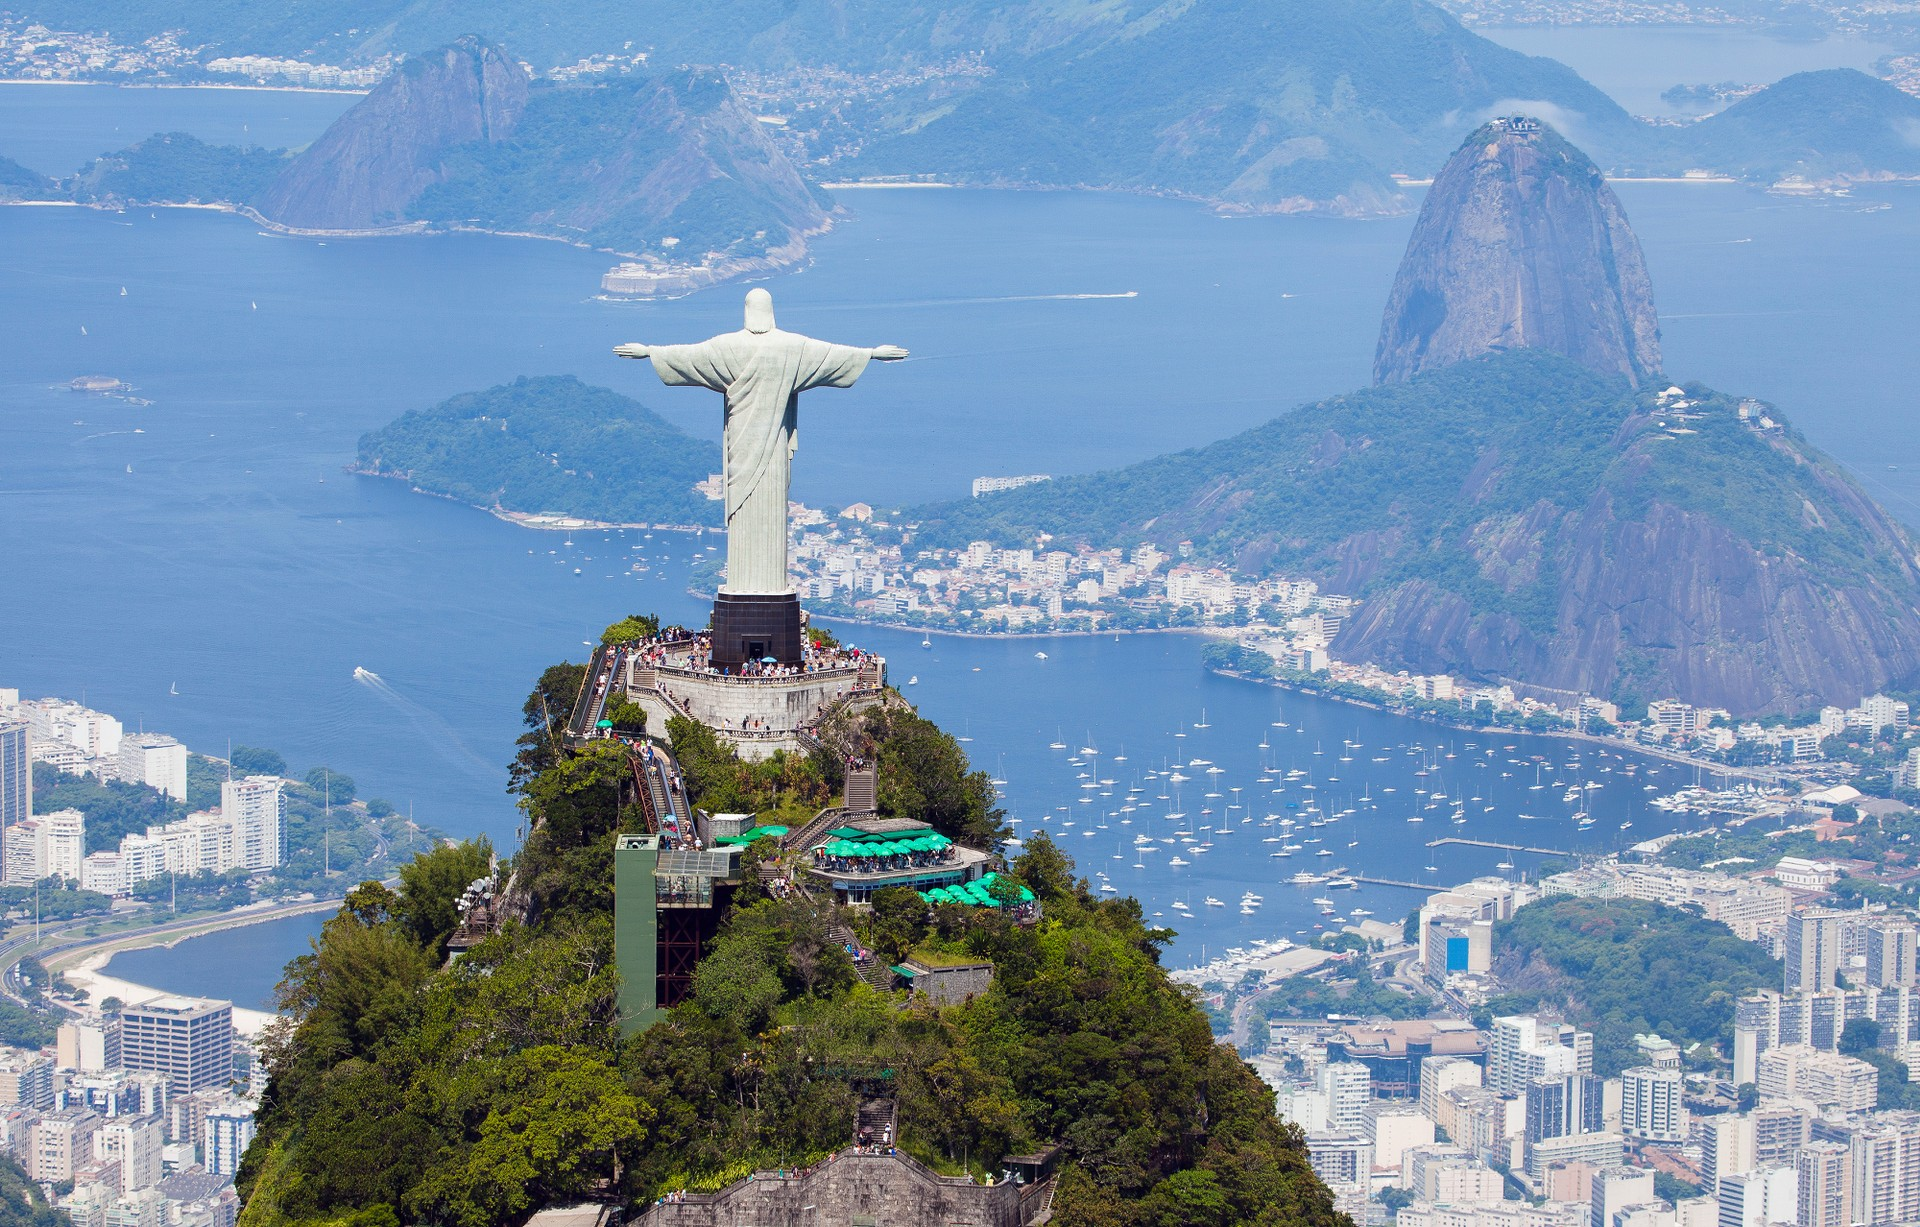 Christ the Redeemer atop the Corcovado mountain